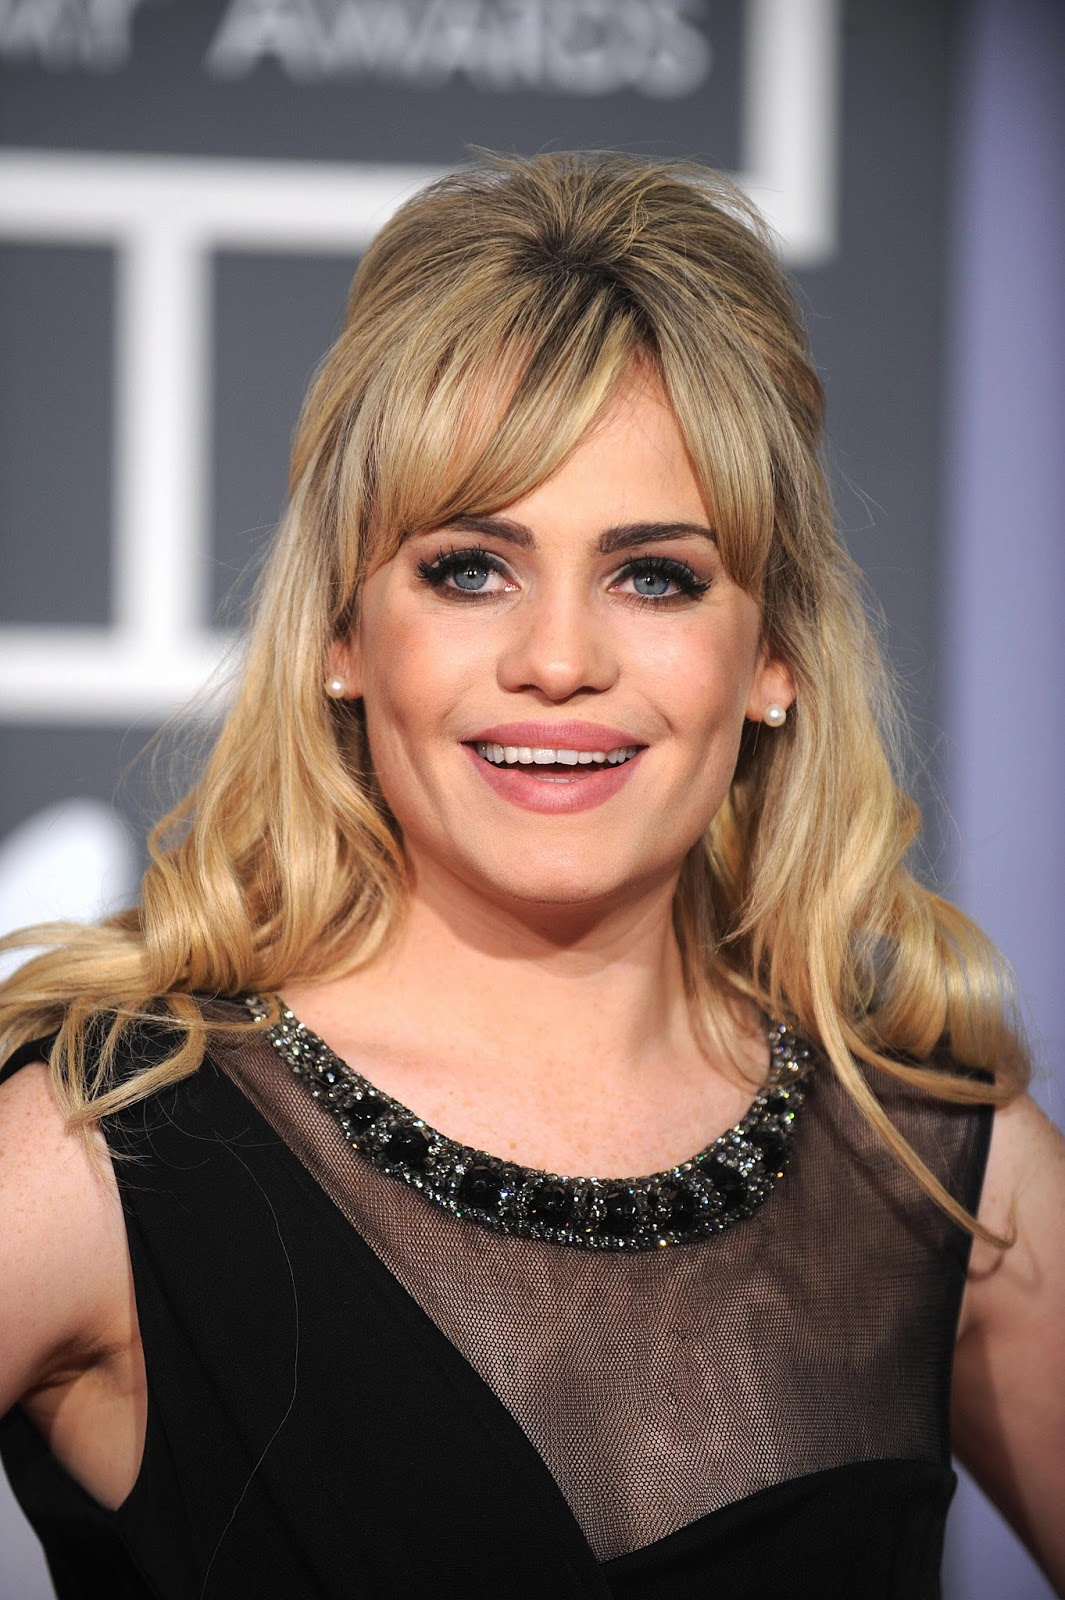 Duffy Cute Hq Photos At 51st Annual Grammy Awards